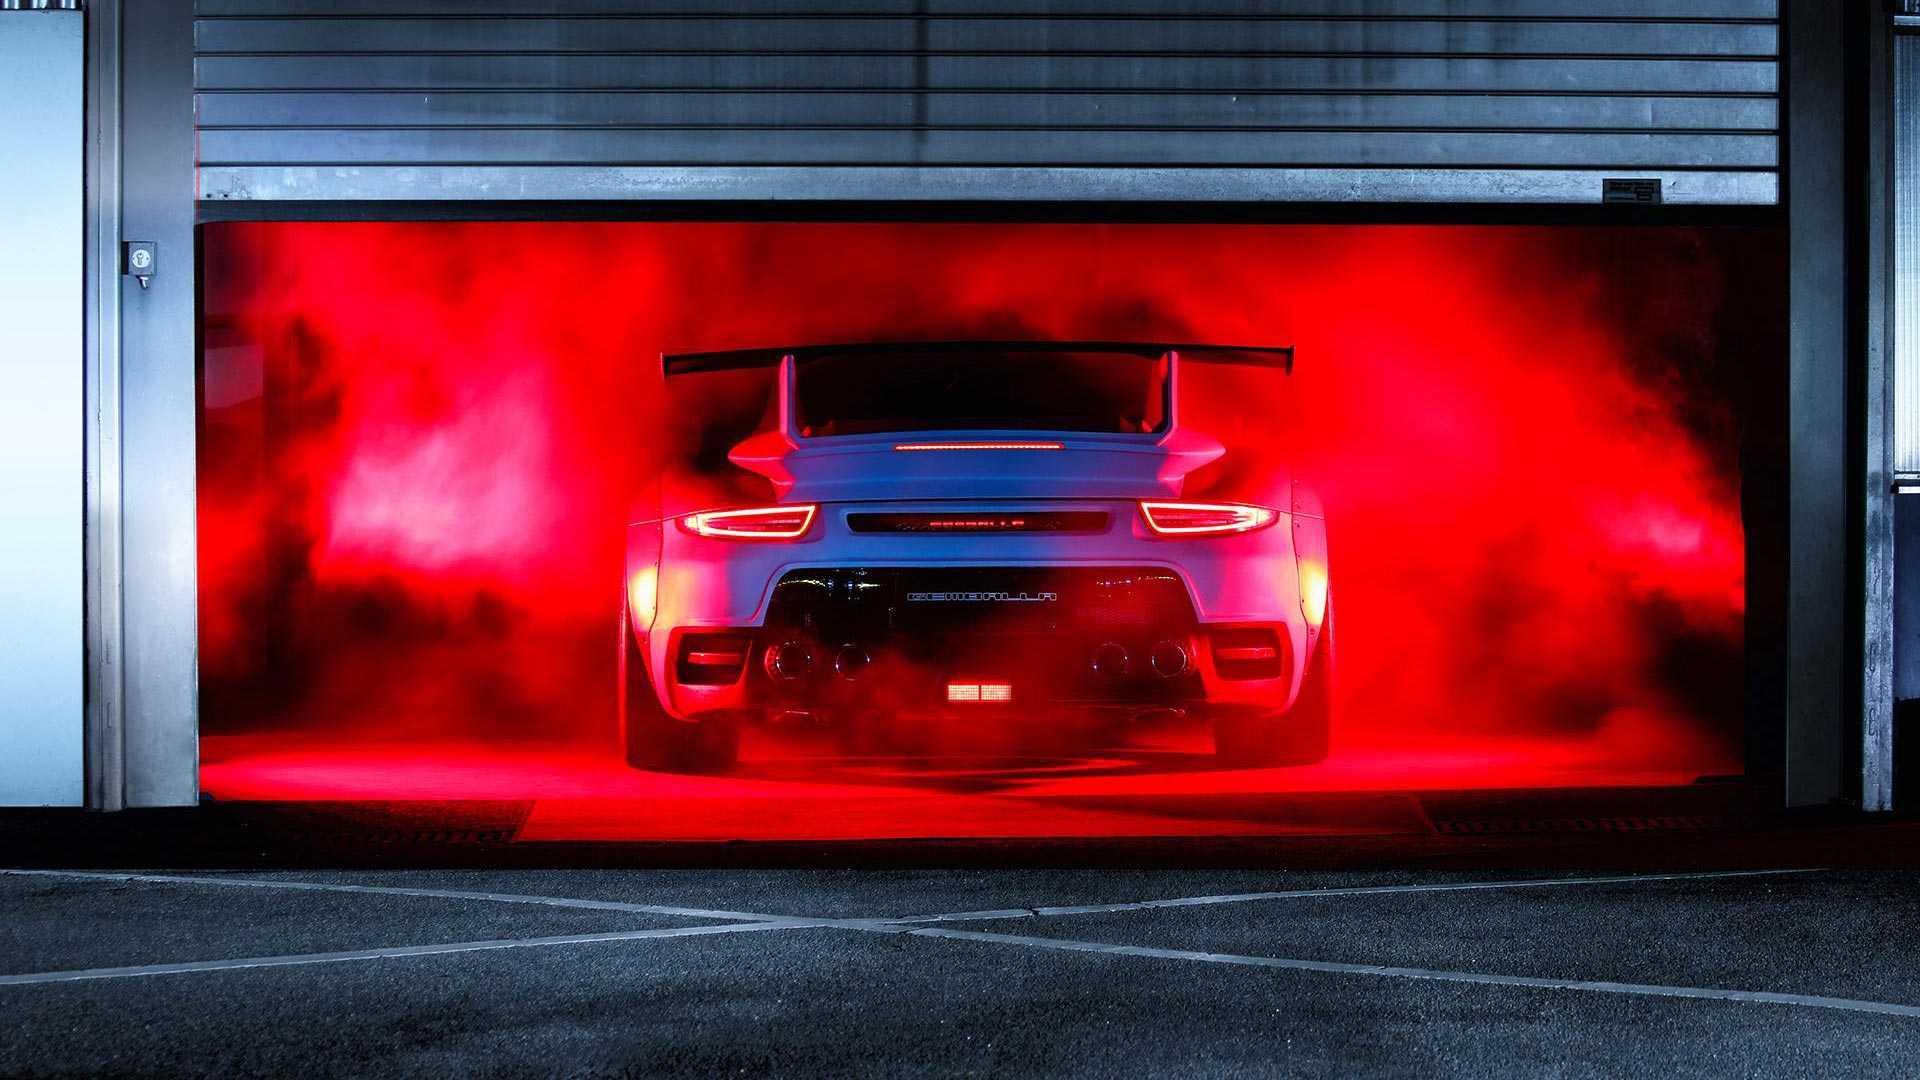 Porsche_911_Turbo_Gemballa-GTR_8XX_Evo-R_0001